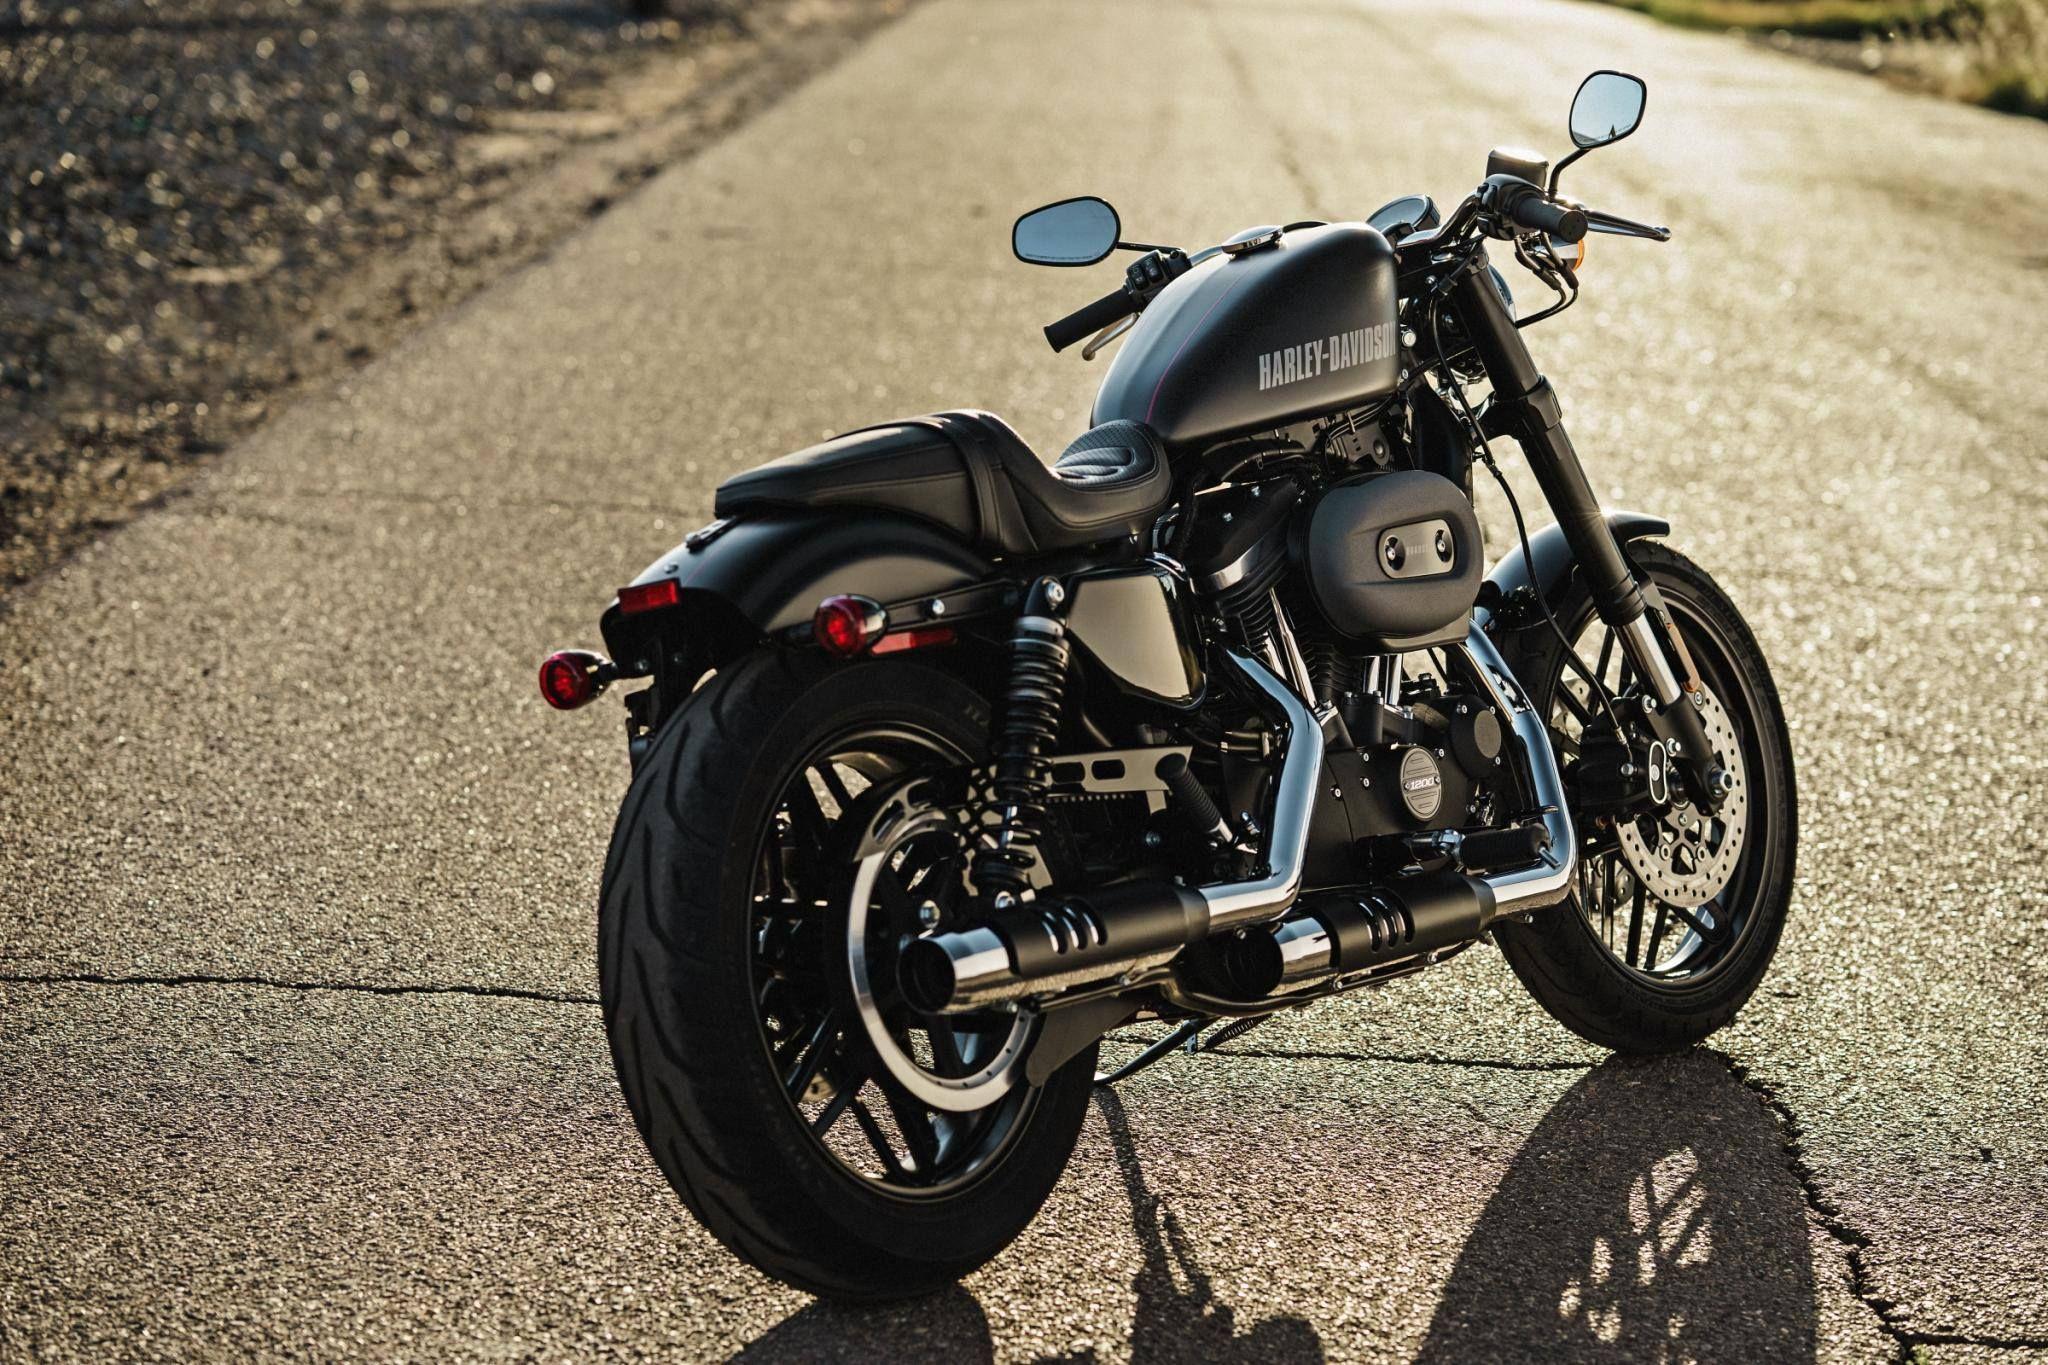 2017 Harley Davidson Roadster Harley Davidson Roadster Harley Davidson Night Train Harley Davidson Wallpaper